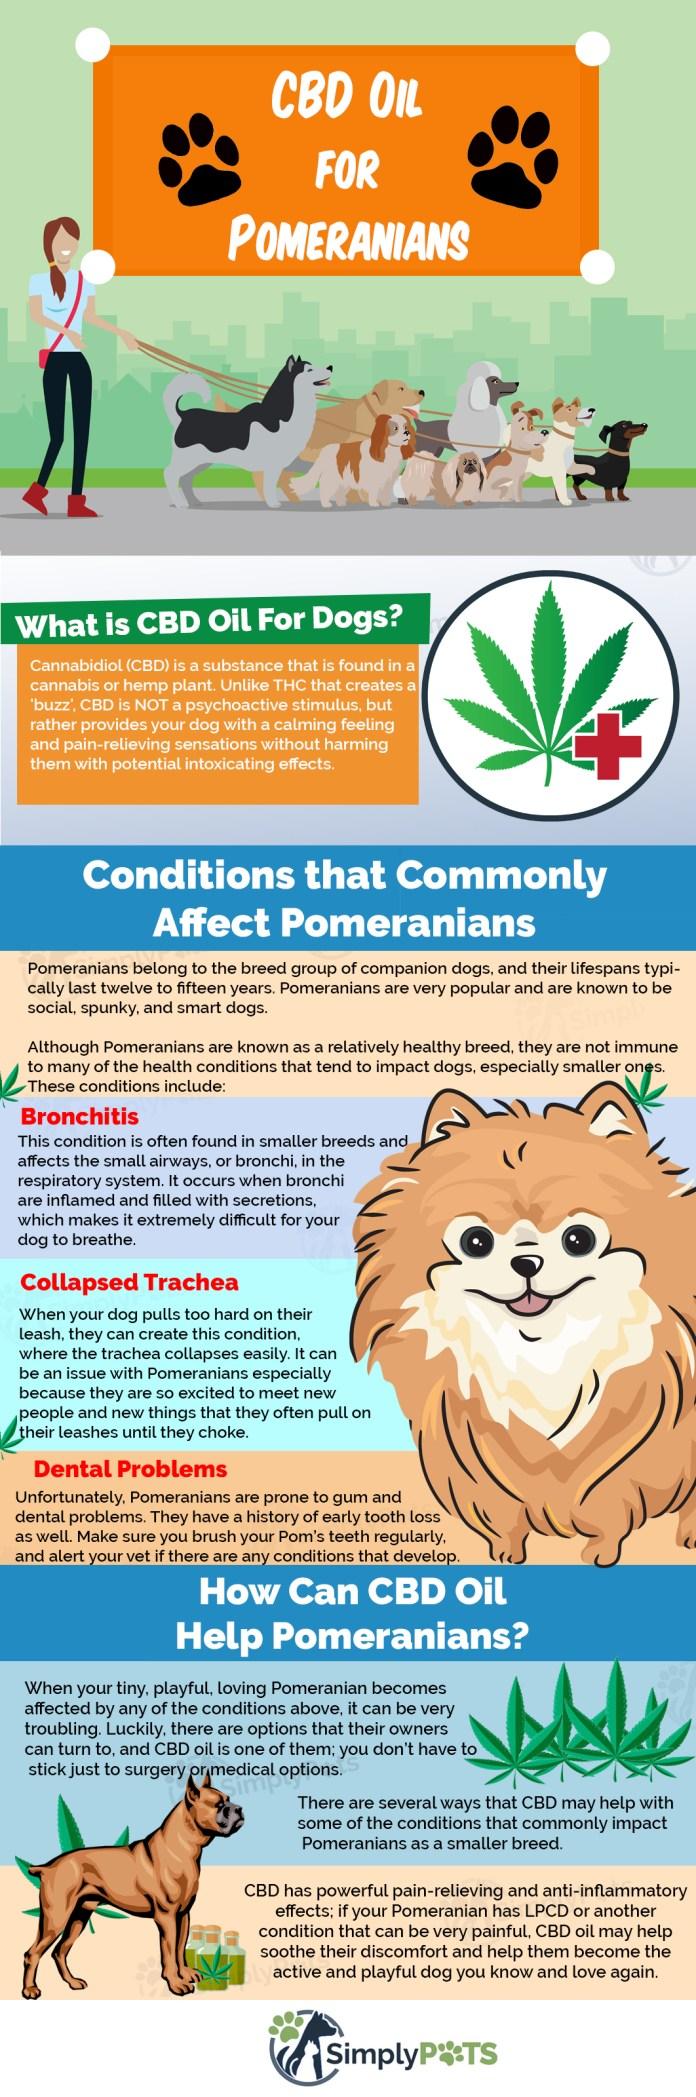 CBD Oil for [POMERANIANS] How Cannabis Hemp Tincture Can